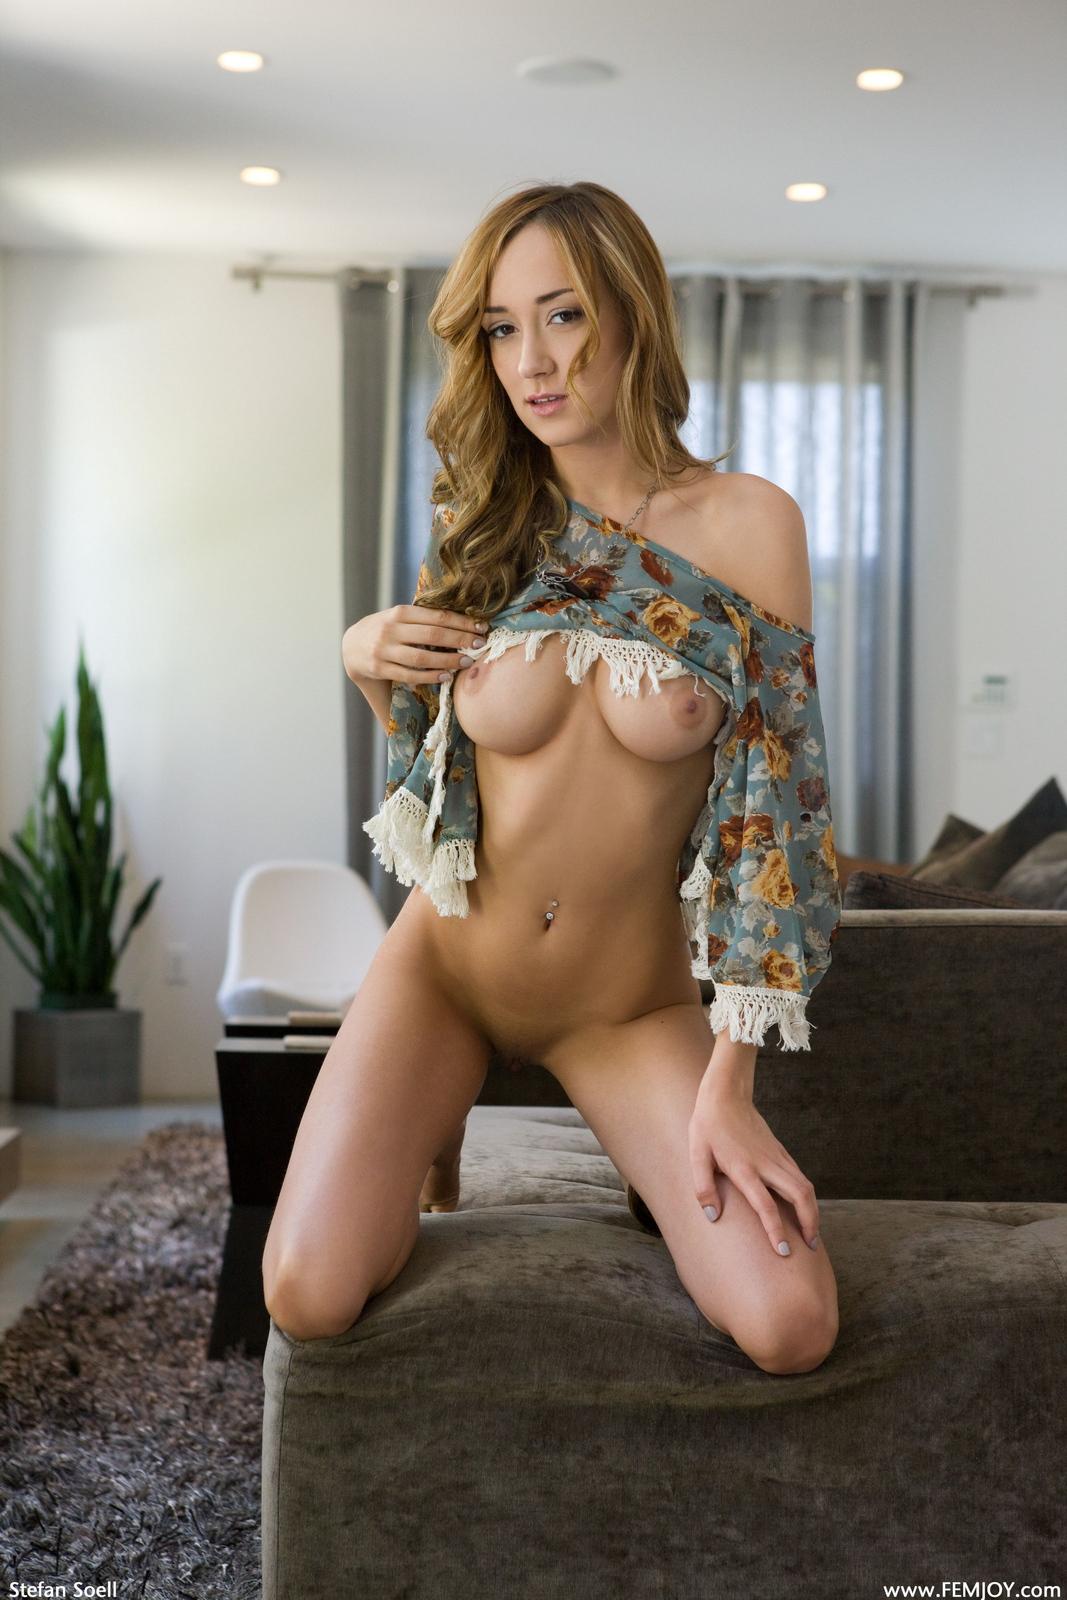 victoria-rae-slim-naked-boobs-apartment-femjoy-14